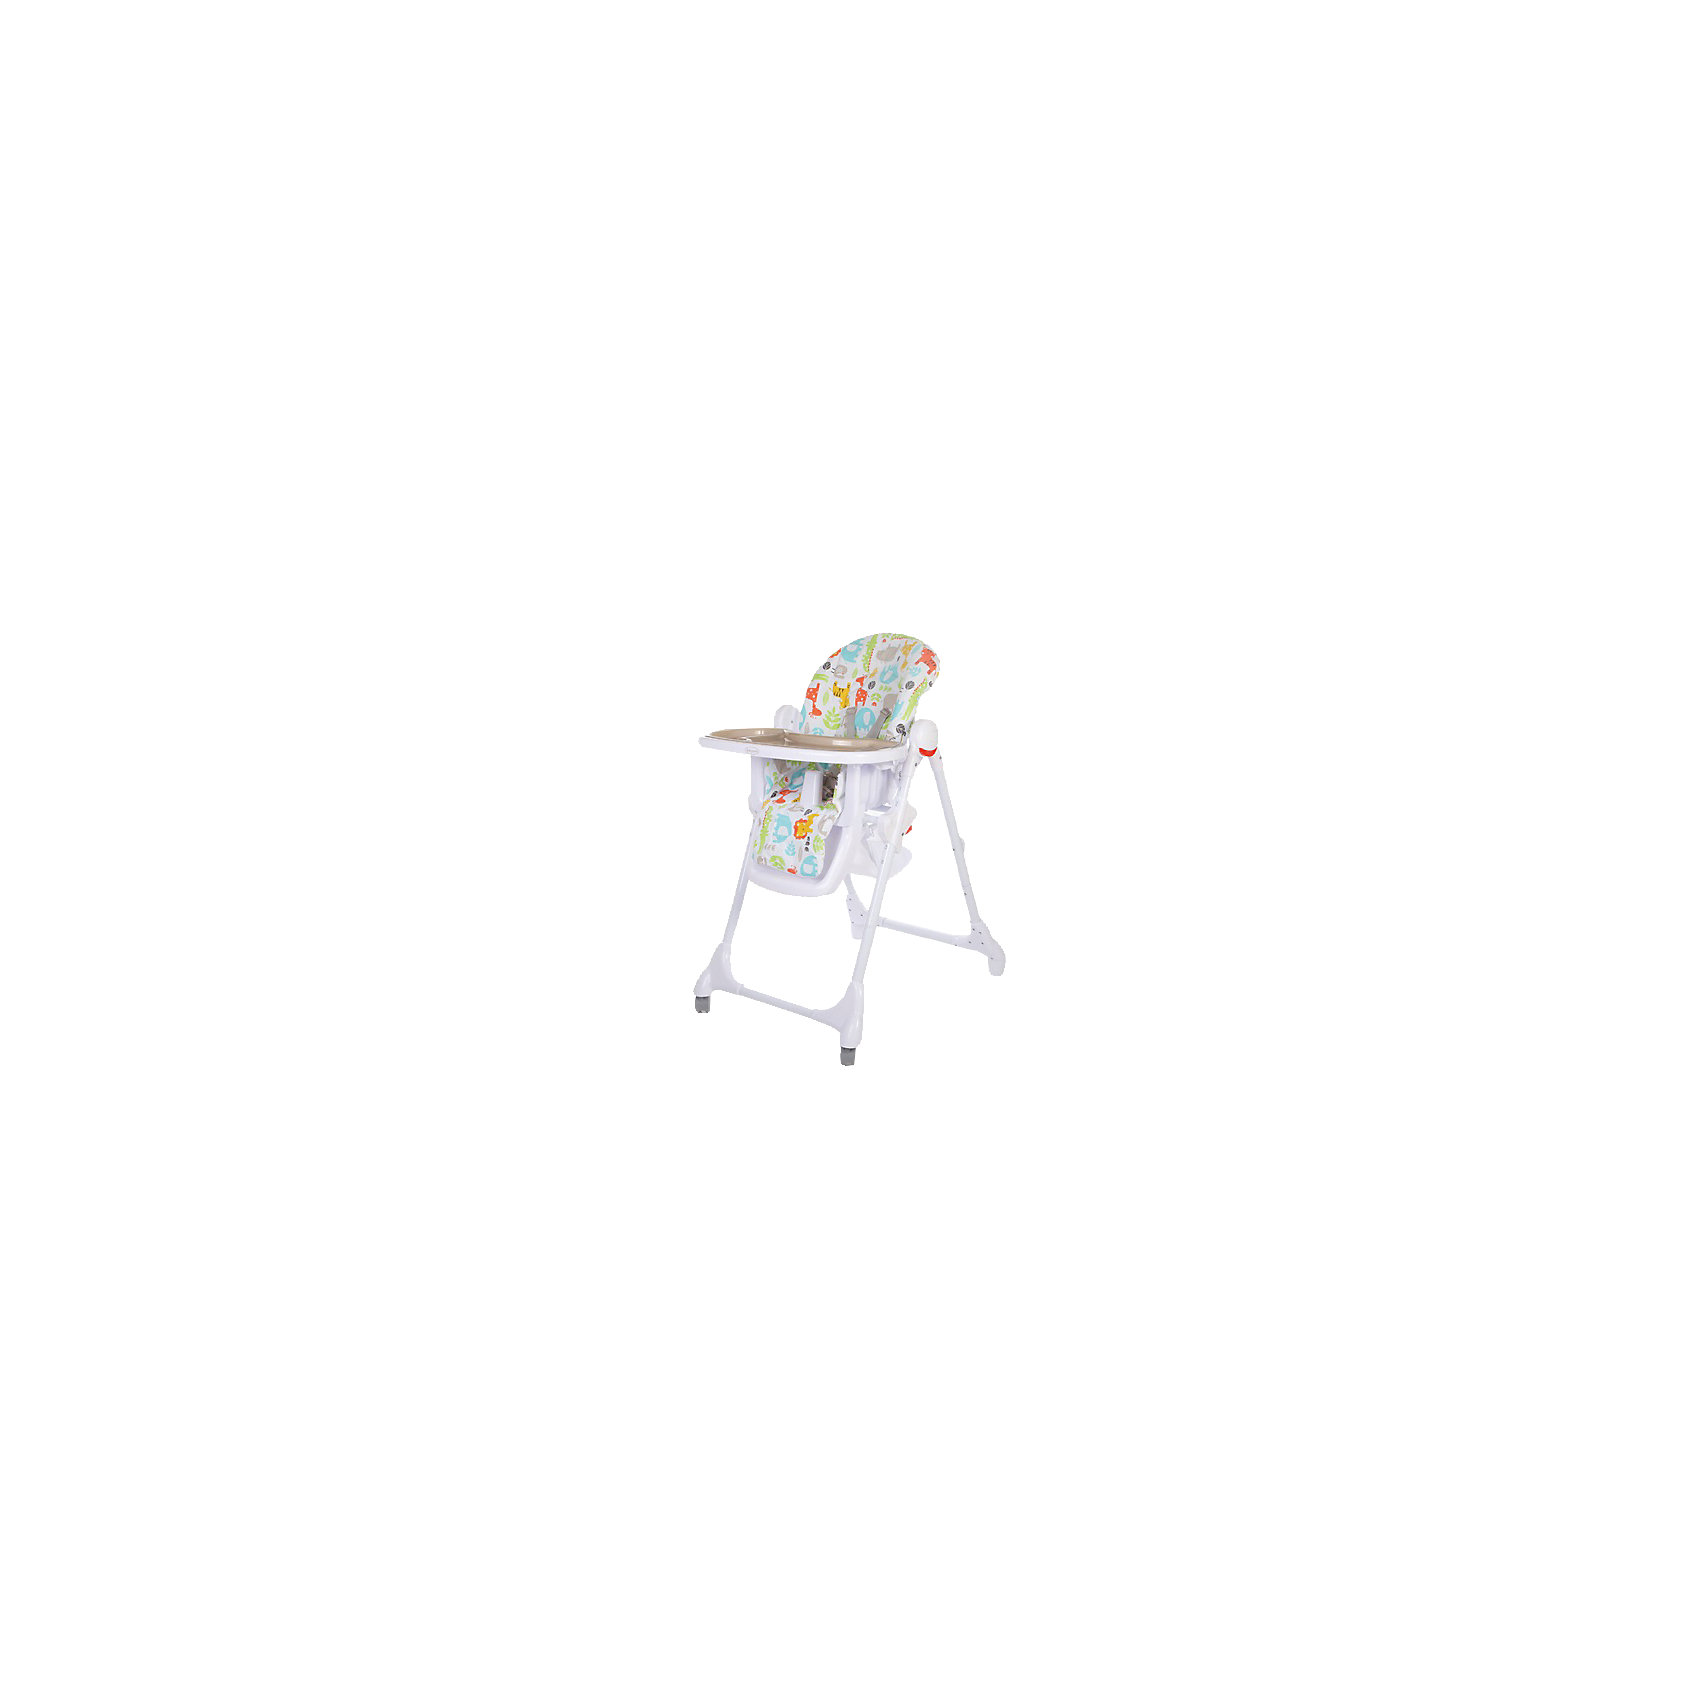 Baby Care Стульчик для кормления Fiesta, Baby Care, katoji механическая люлька стульчик katoji